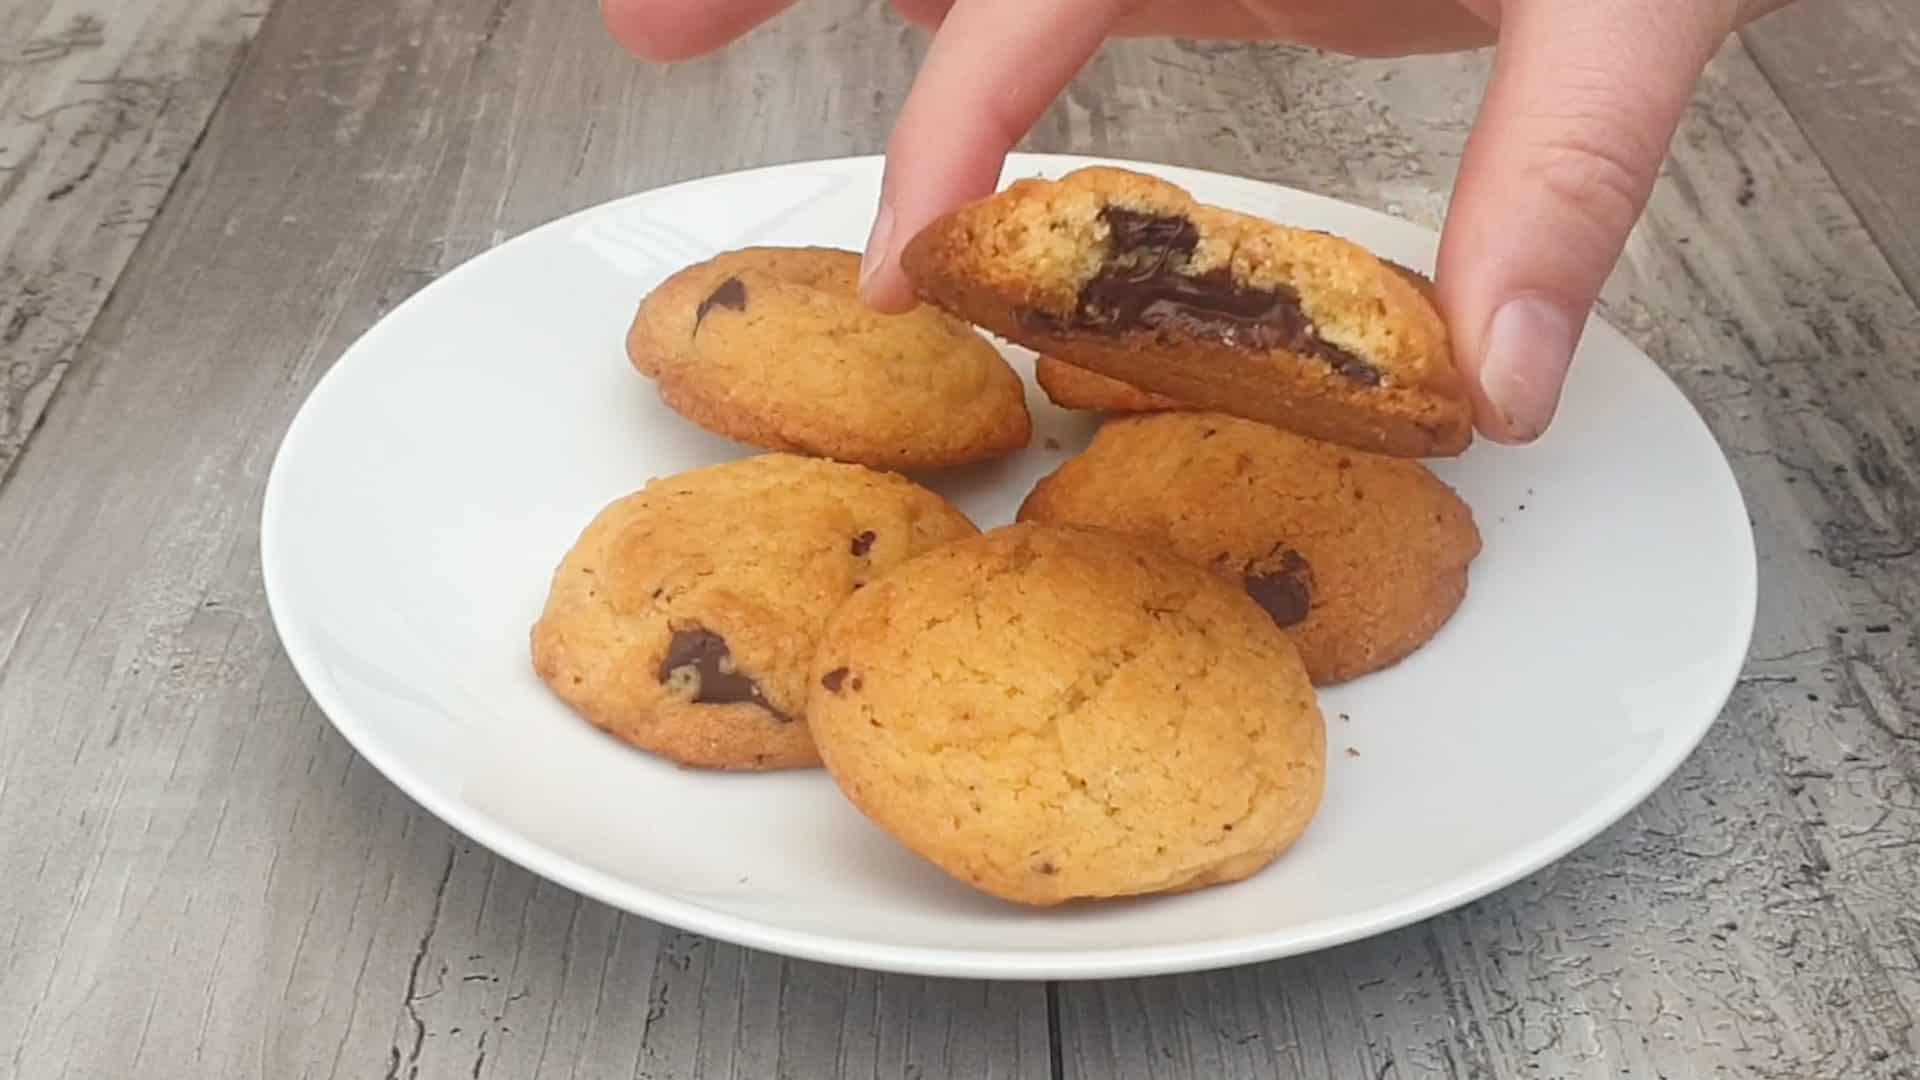 Habanero chocolate chip cookies